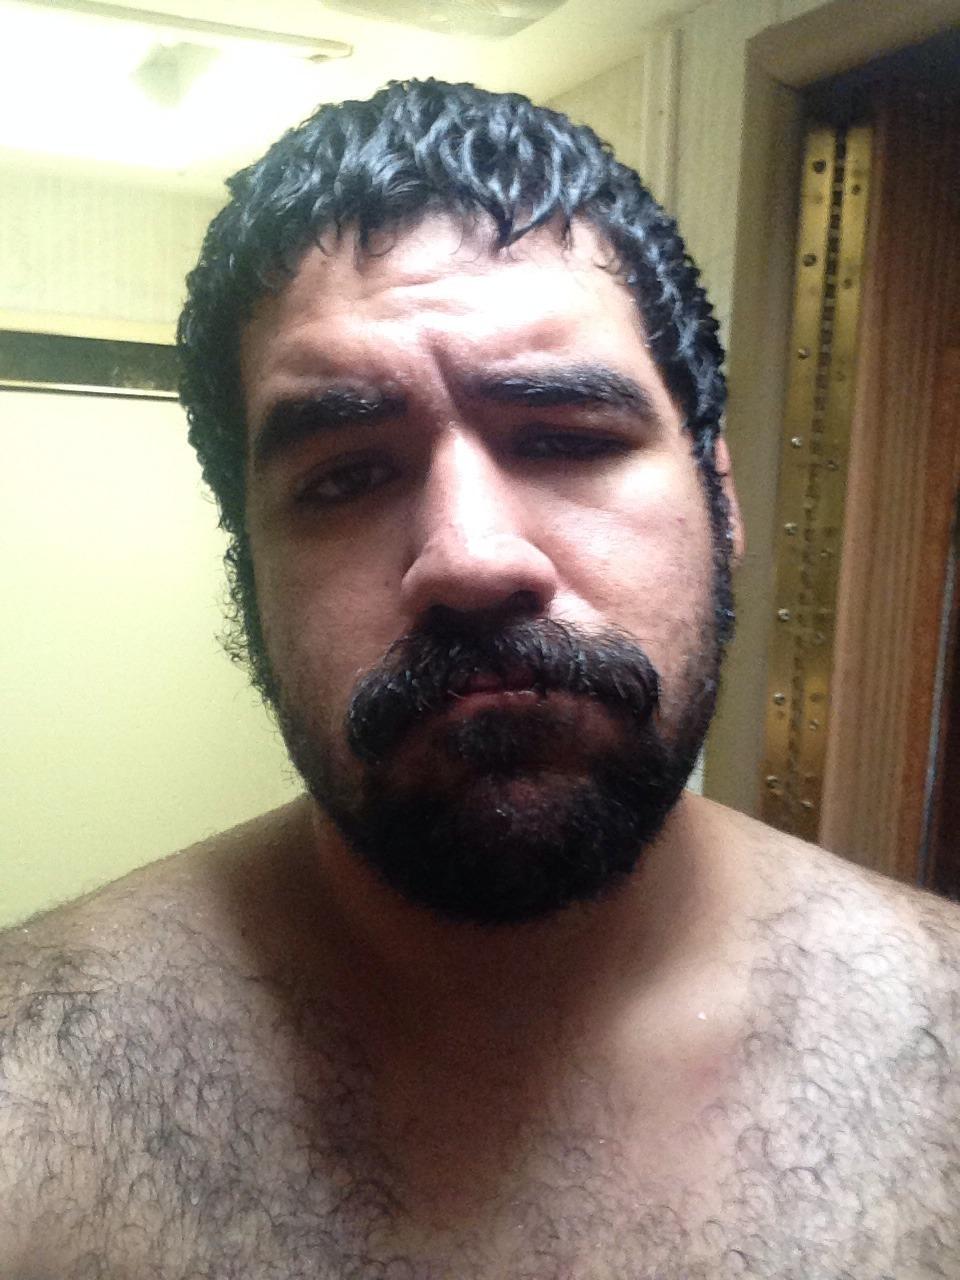 2018-06-04 05:23:00 - iwannabeyourgentleman guess who actually fuckin beardburnme http://www.neofic.com